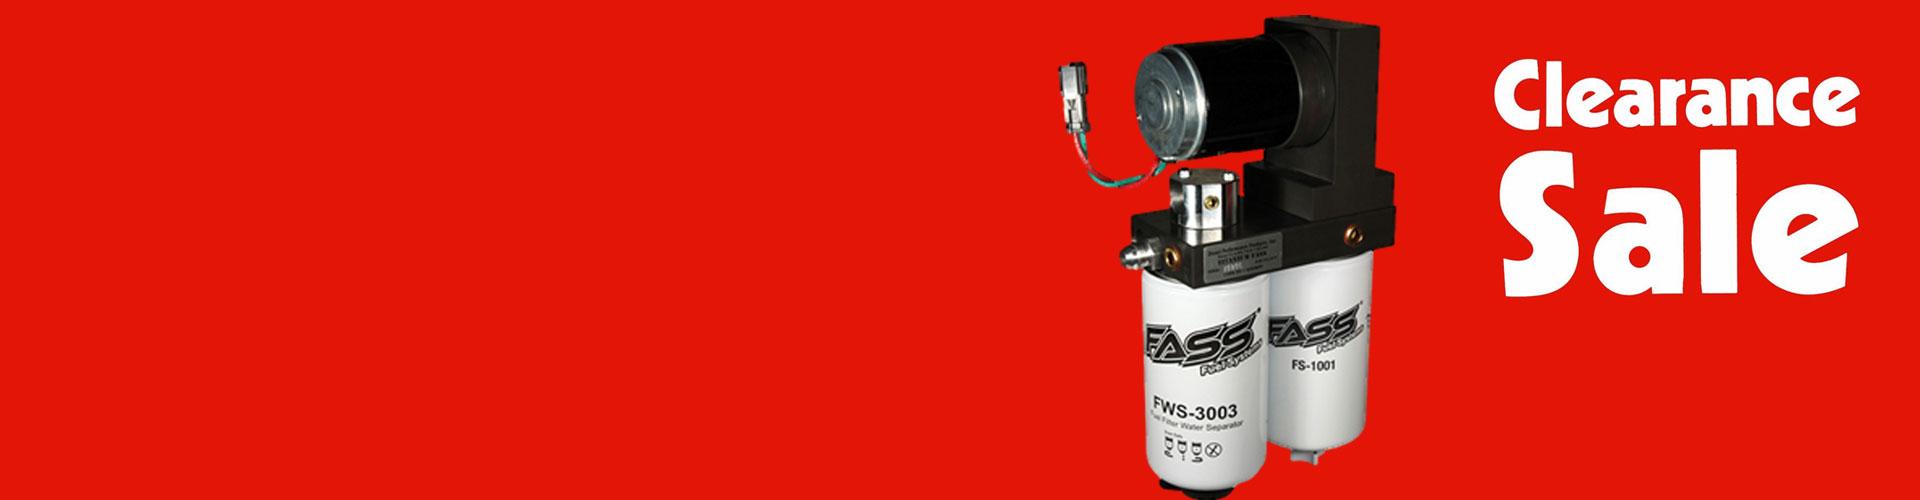 Diesel Performance Parts Cummins Powerstroke Duramax 89 Ford F 250 Fuel Filter Fass Titanium Pump Clearance Sale